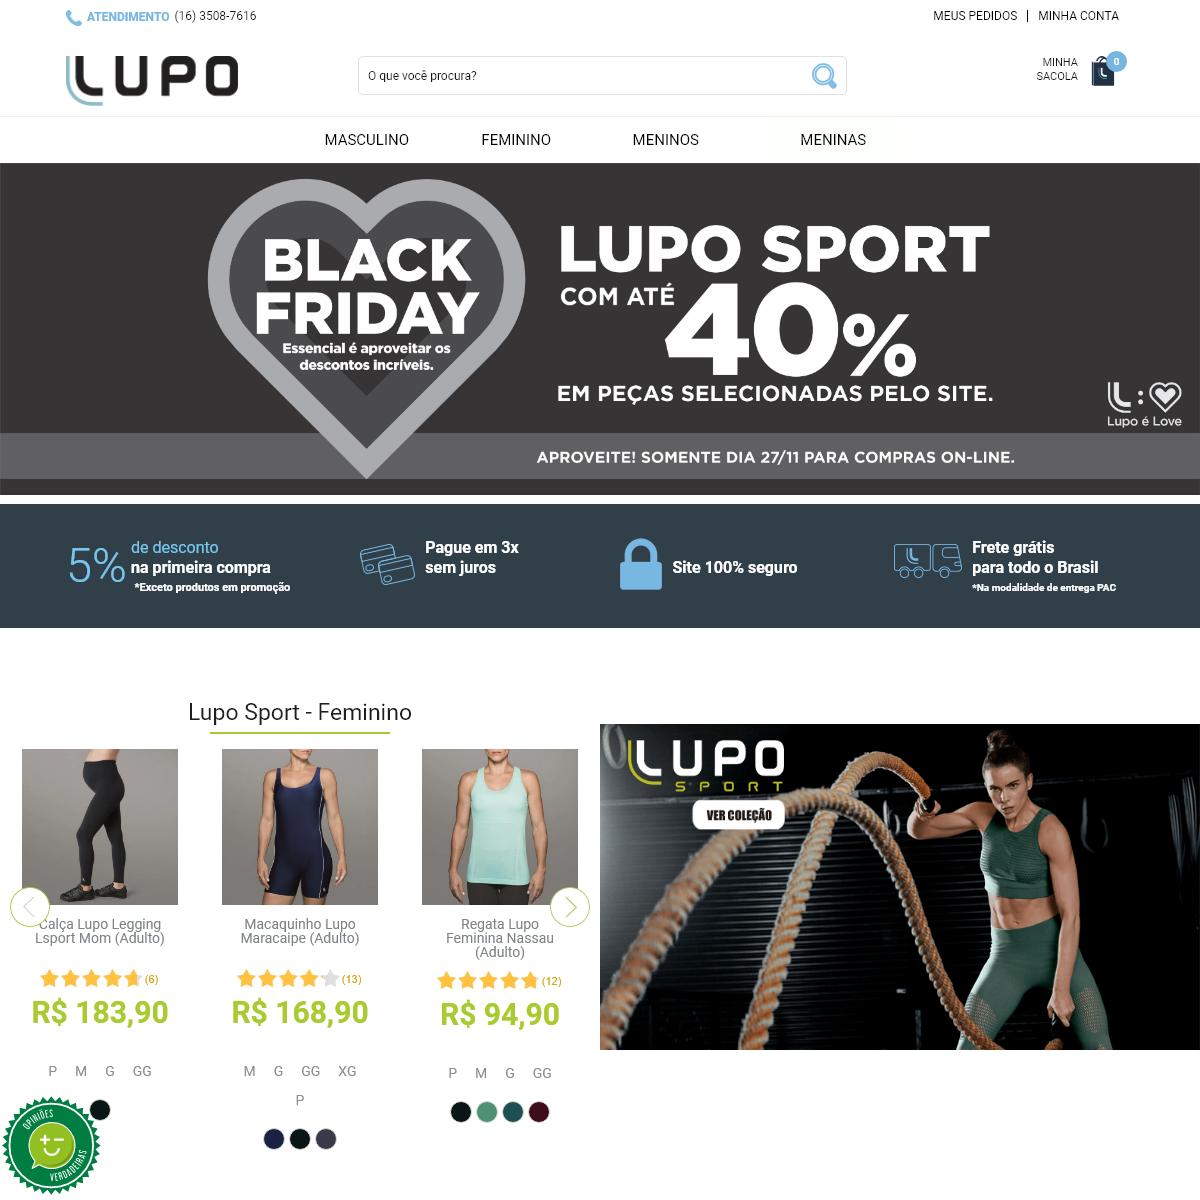 Lupo Oficial - Loja Online - Roupas Esportivas, Moda Íntima Feminina e Masculina